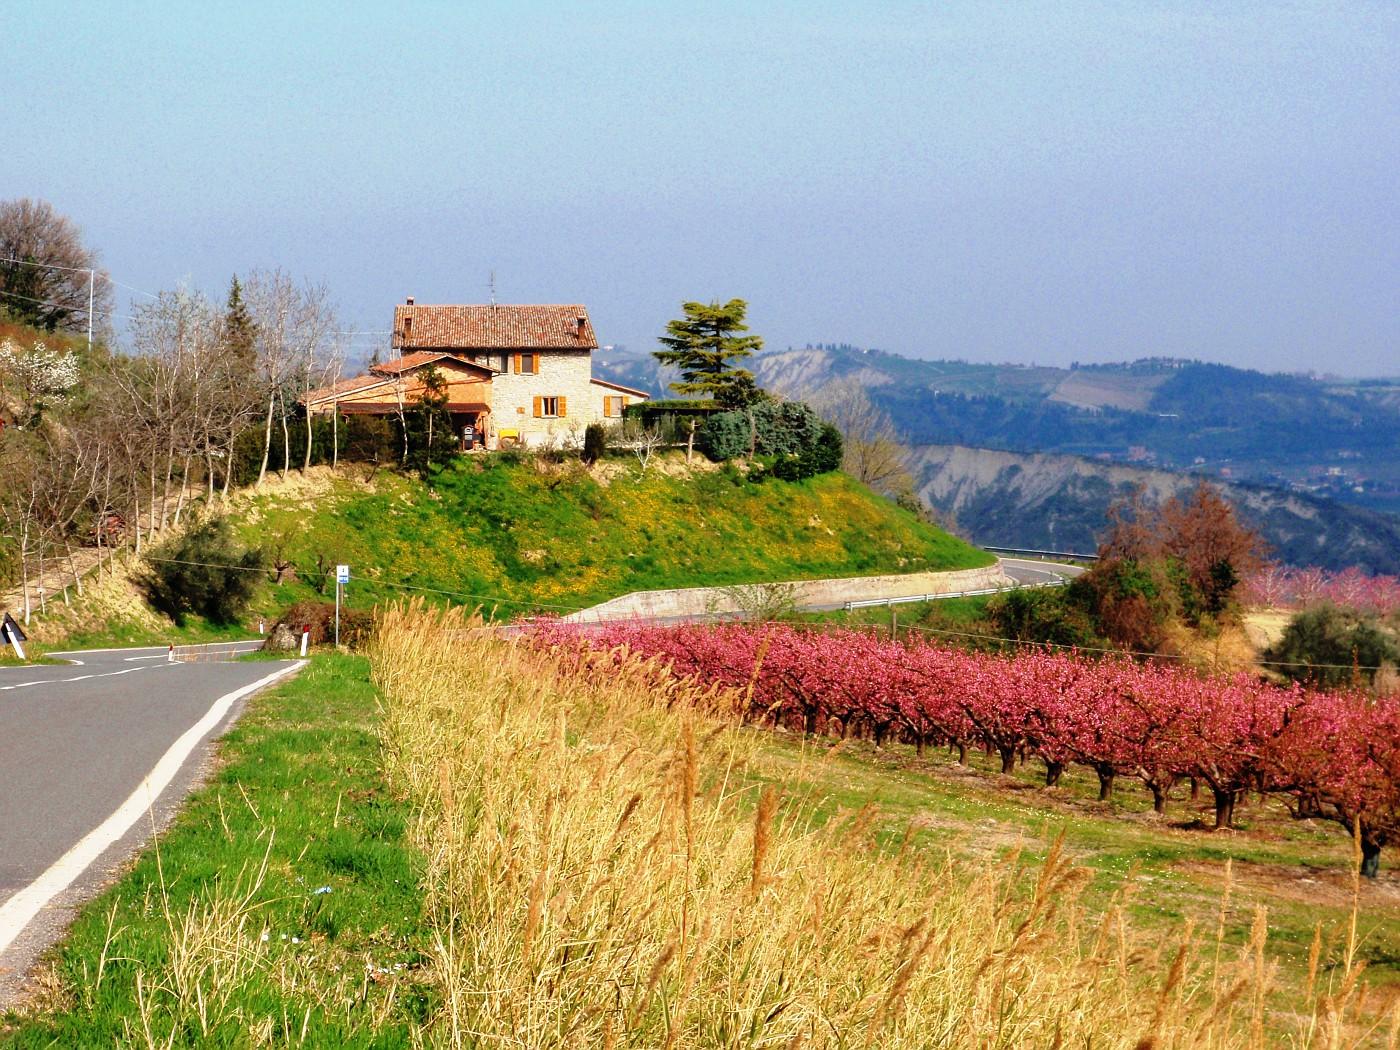 Monte Mauro